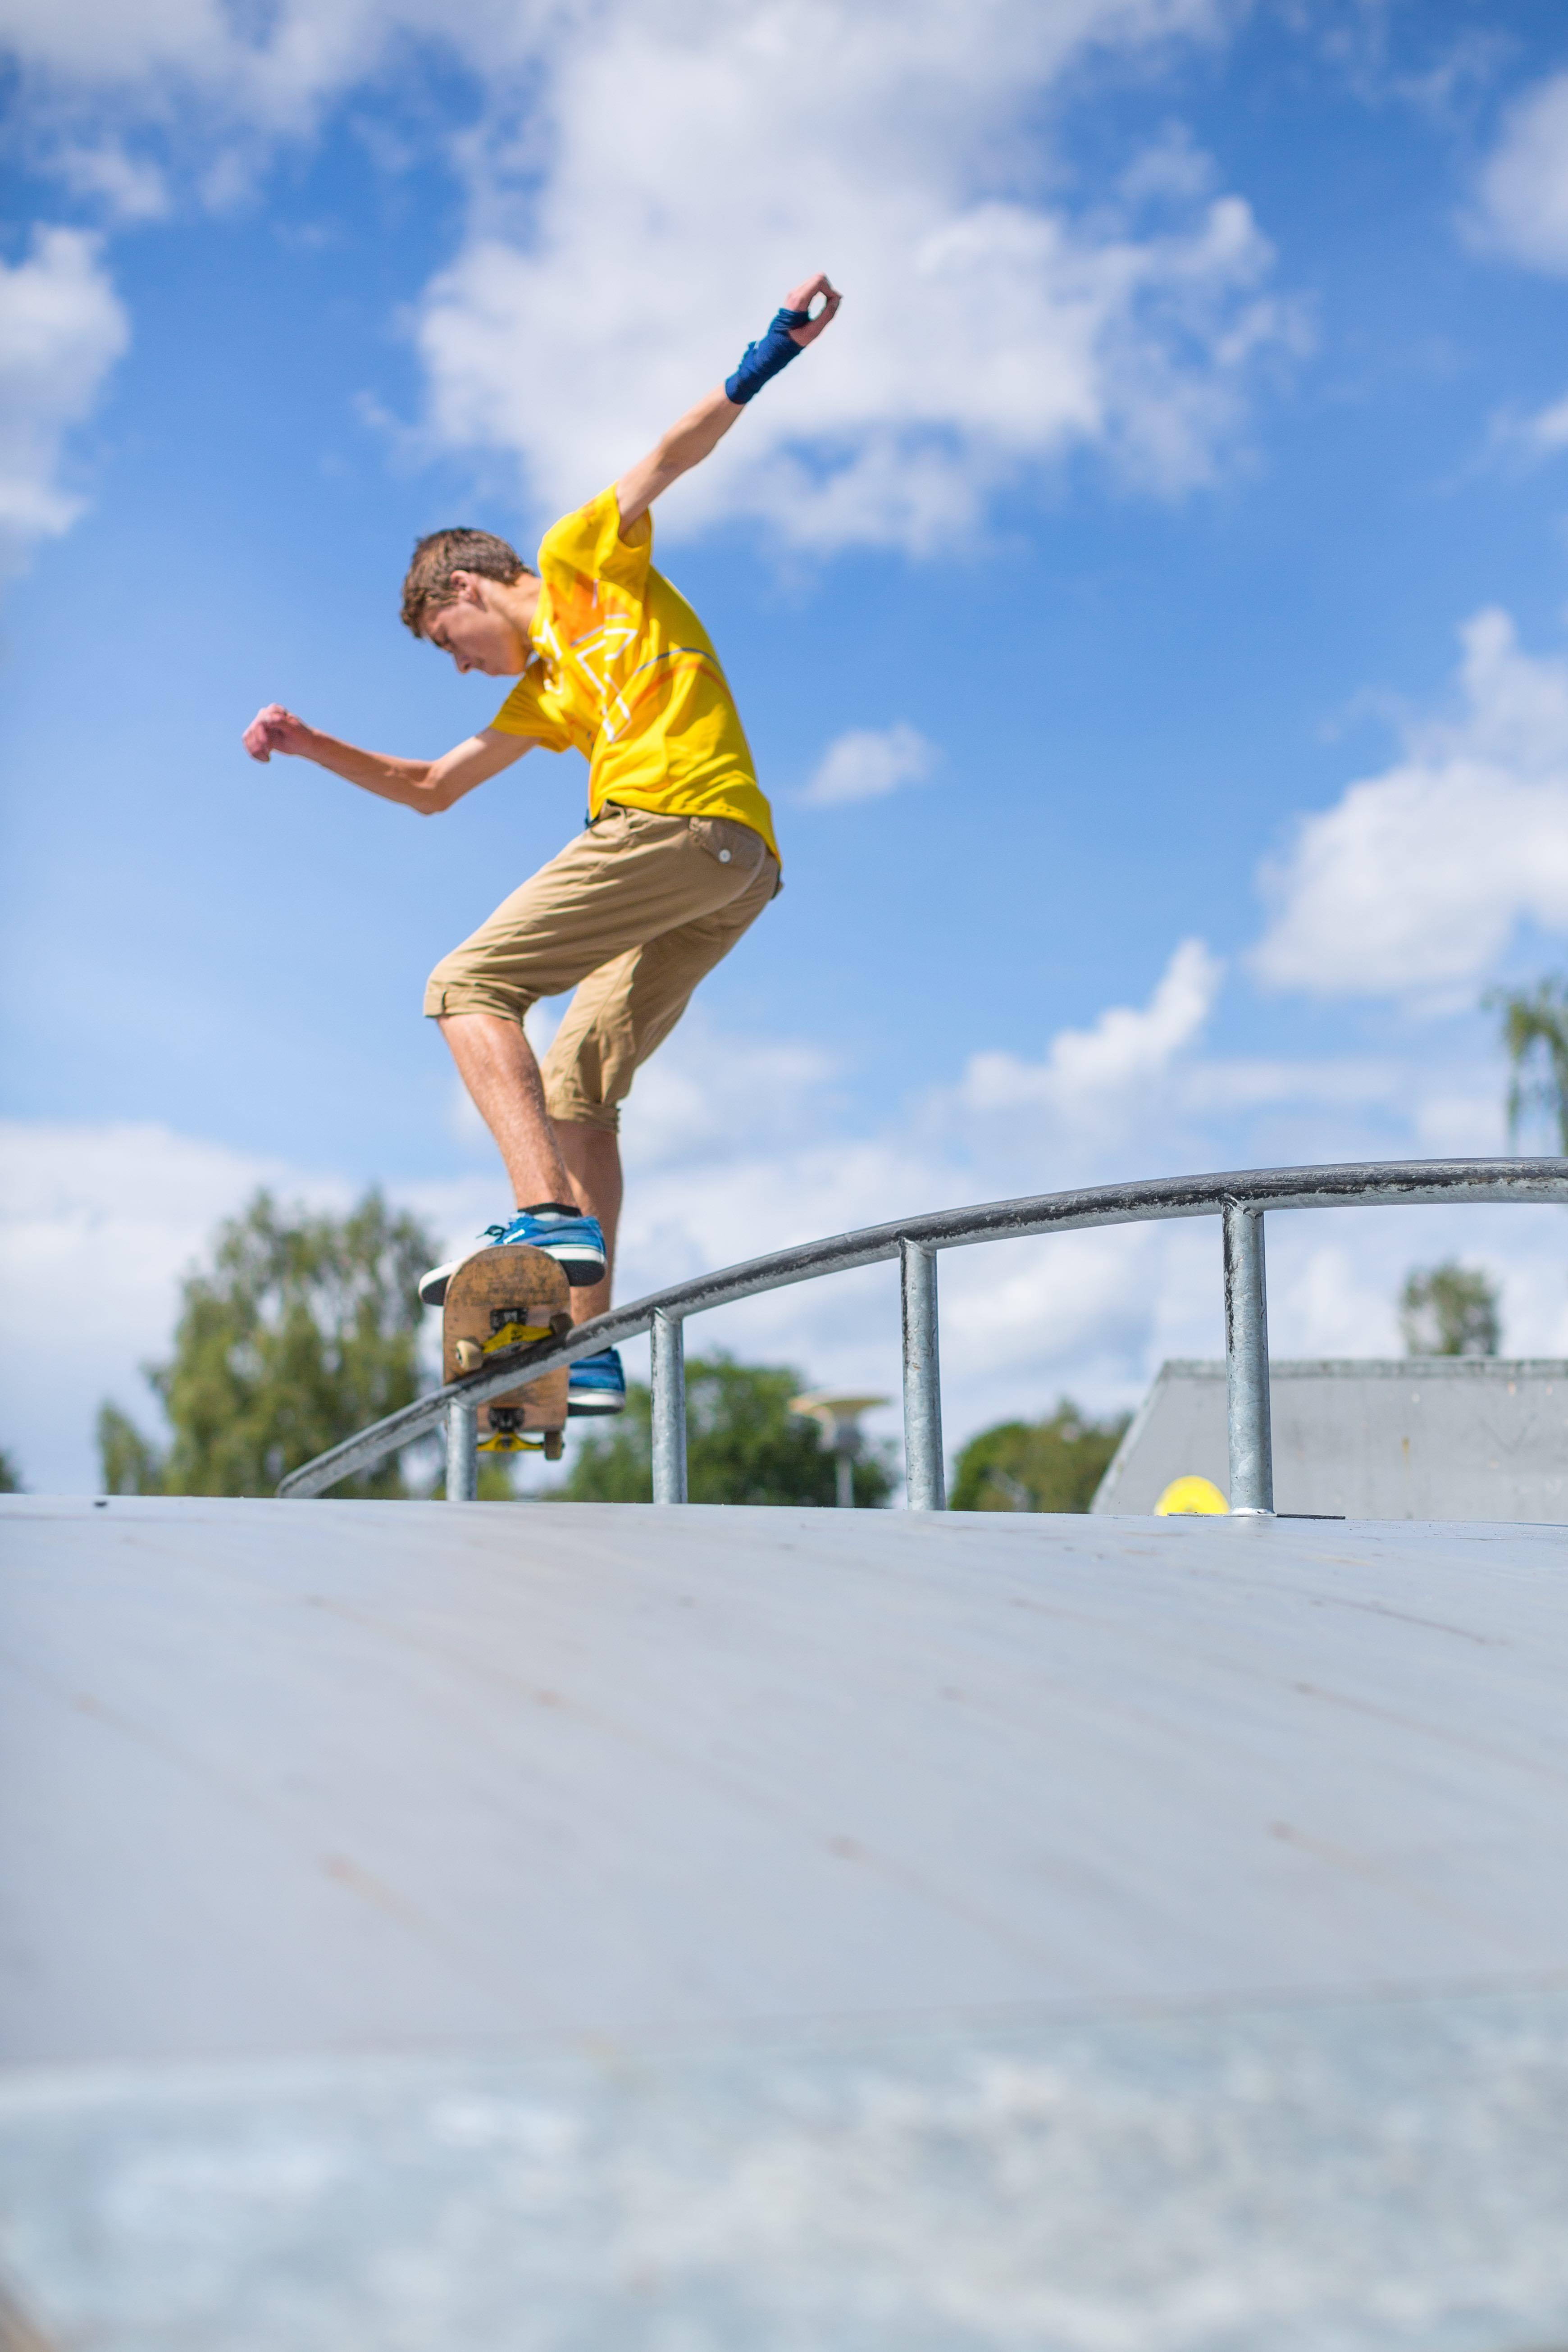 arturs-bogdanovics-skateboard-2